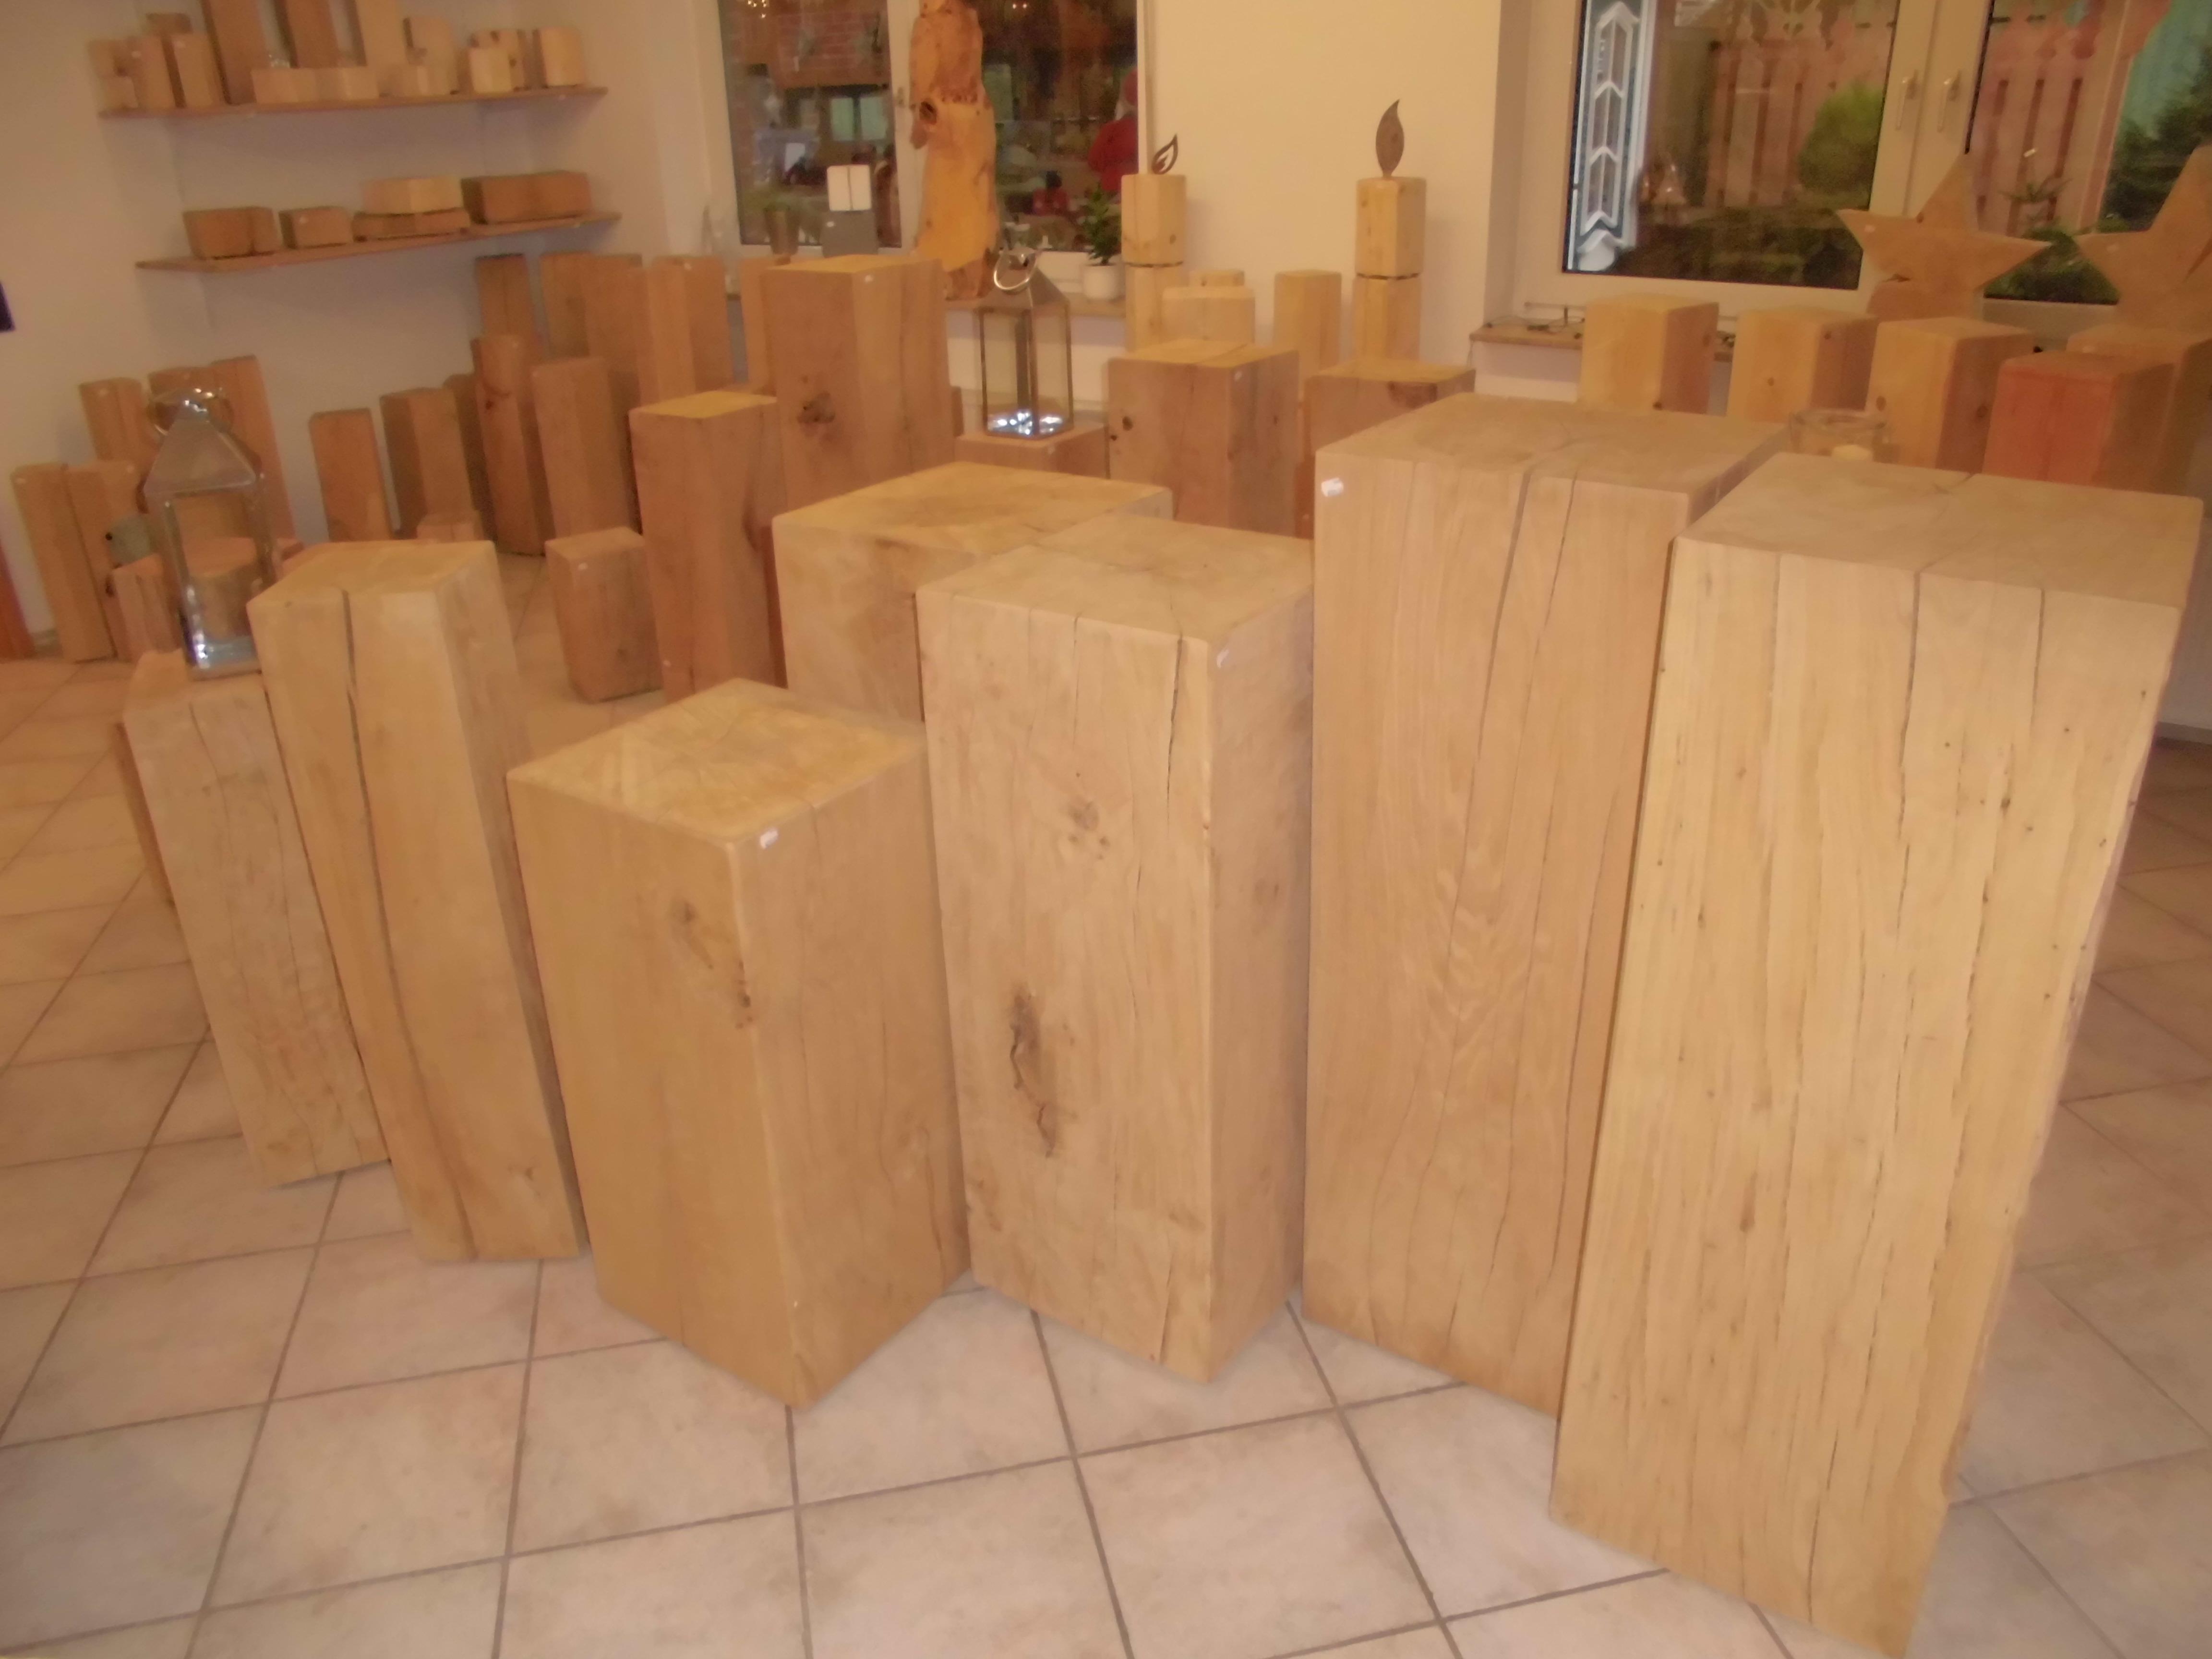 Eichenholzsäule gehobelt, geschliffen, angefast 40x40x80cm